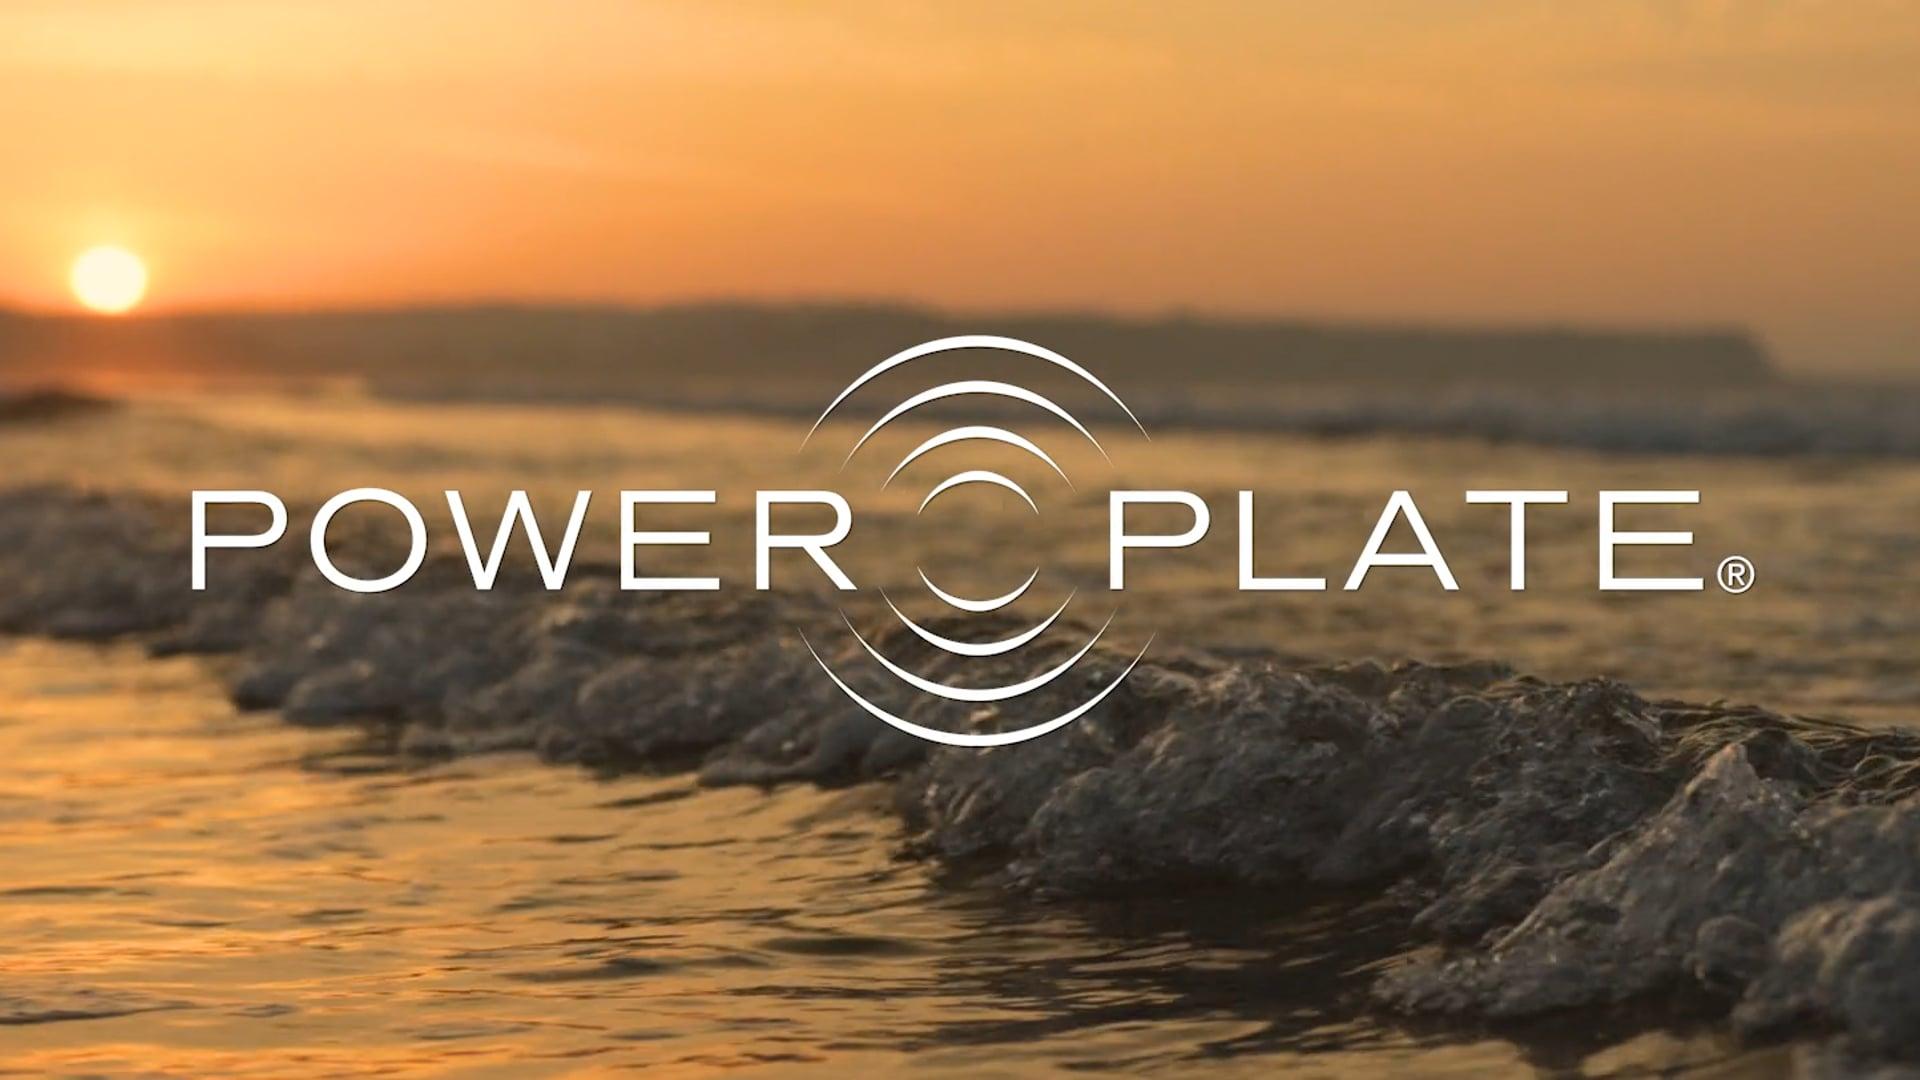 Power Plate & Peugeot - Advertising